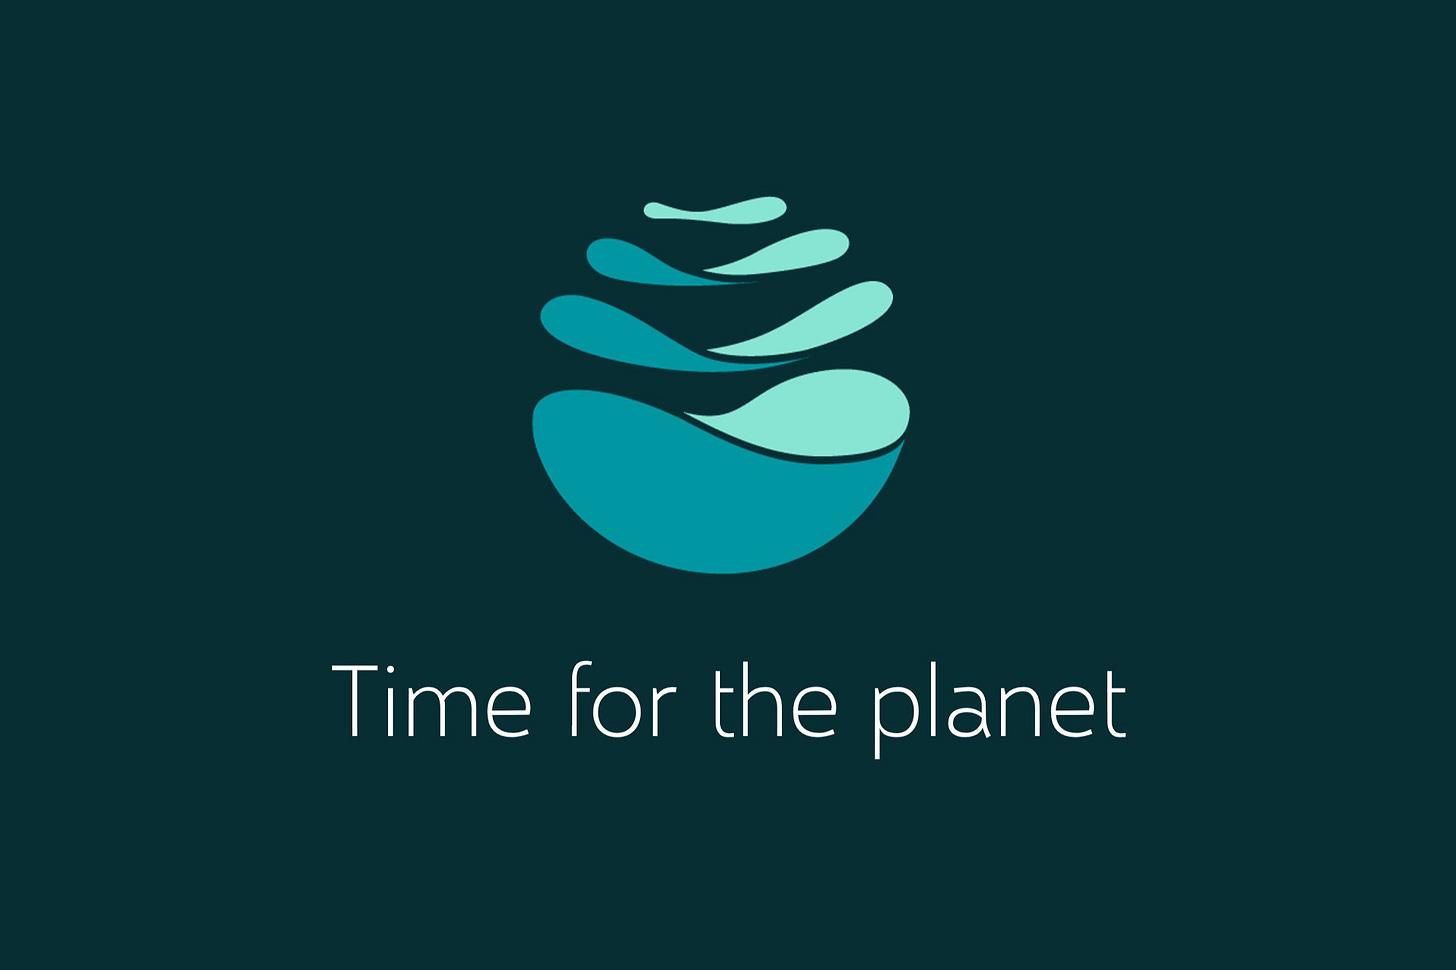 https://i2.wp.com/le-m-verbatem.fr/wp-content/uploads/2020/11/time-for-the-planet.jpg?fit=2000%2C1333